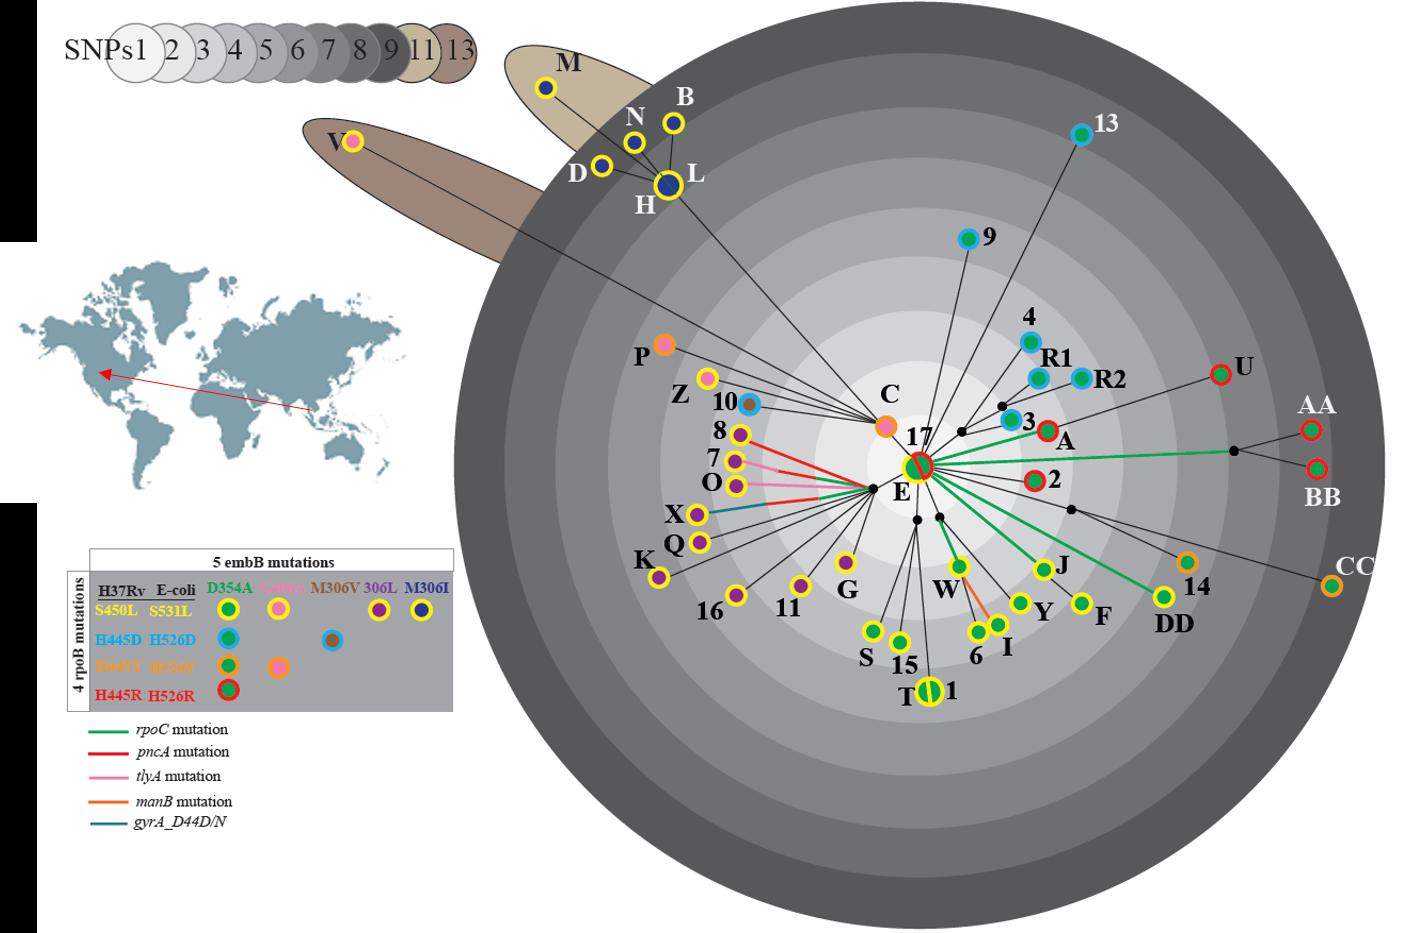 Genomic epidemiology